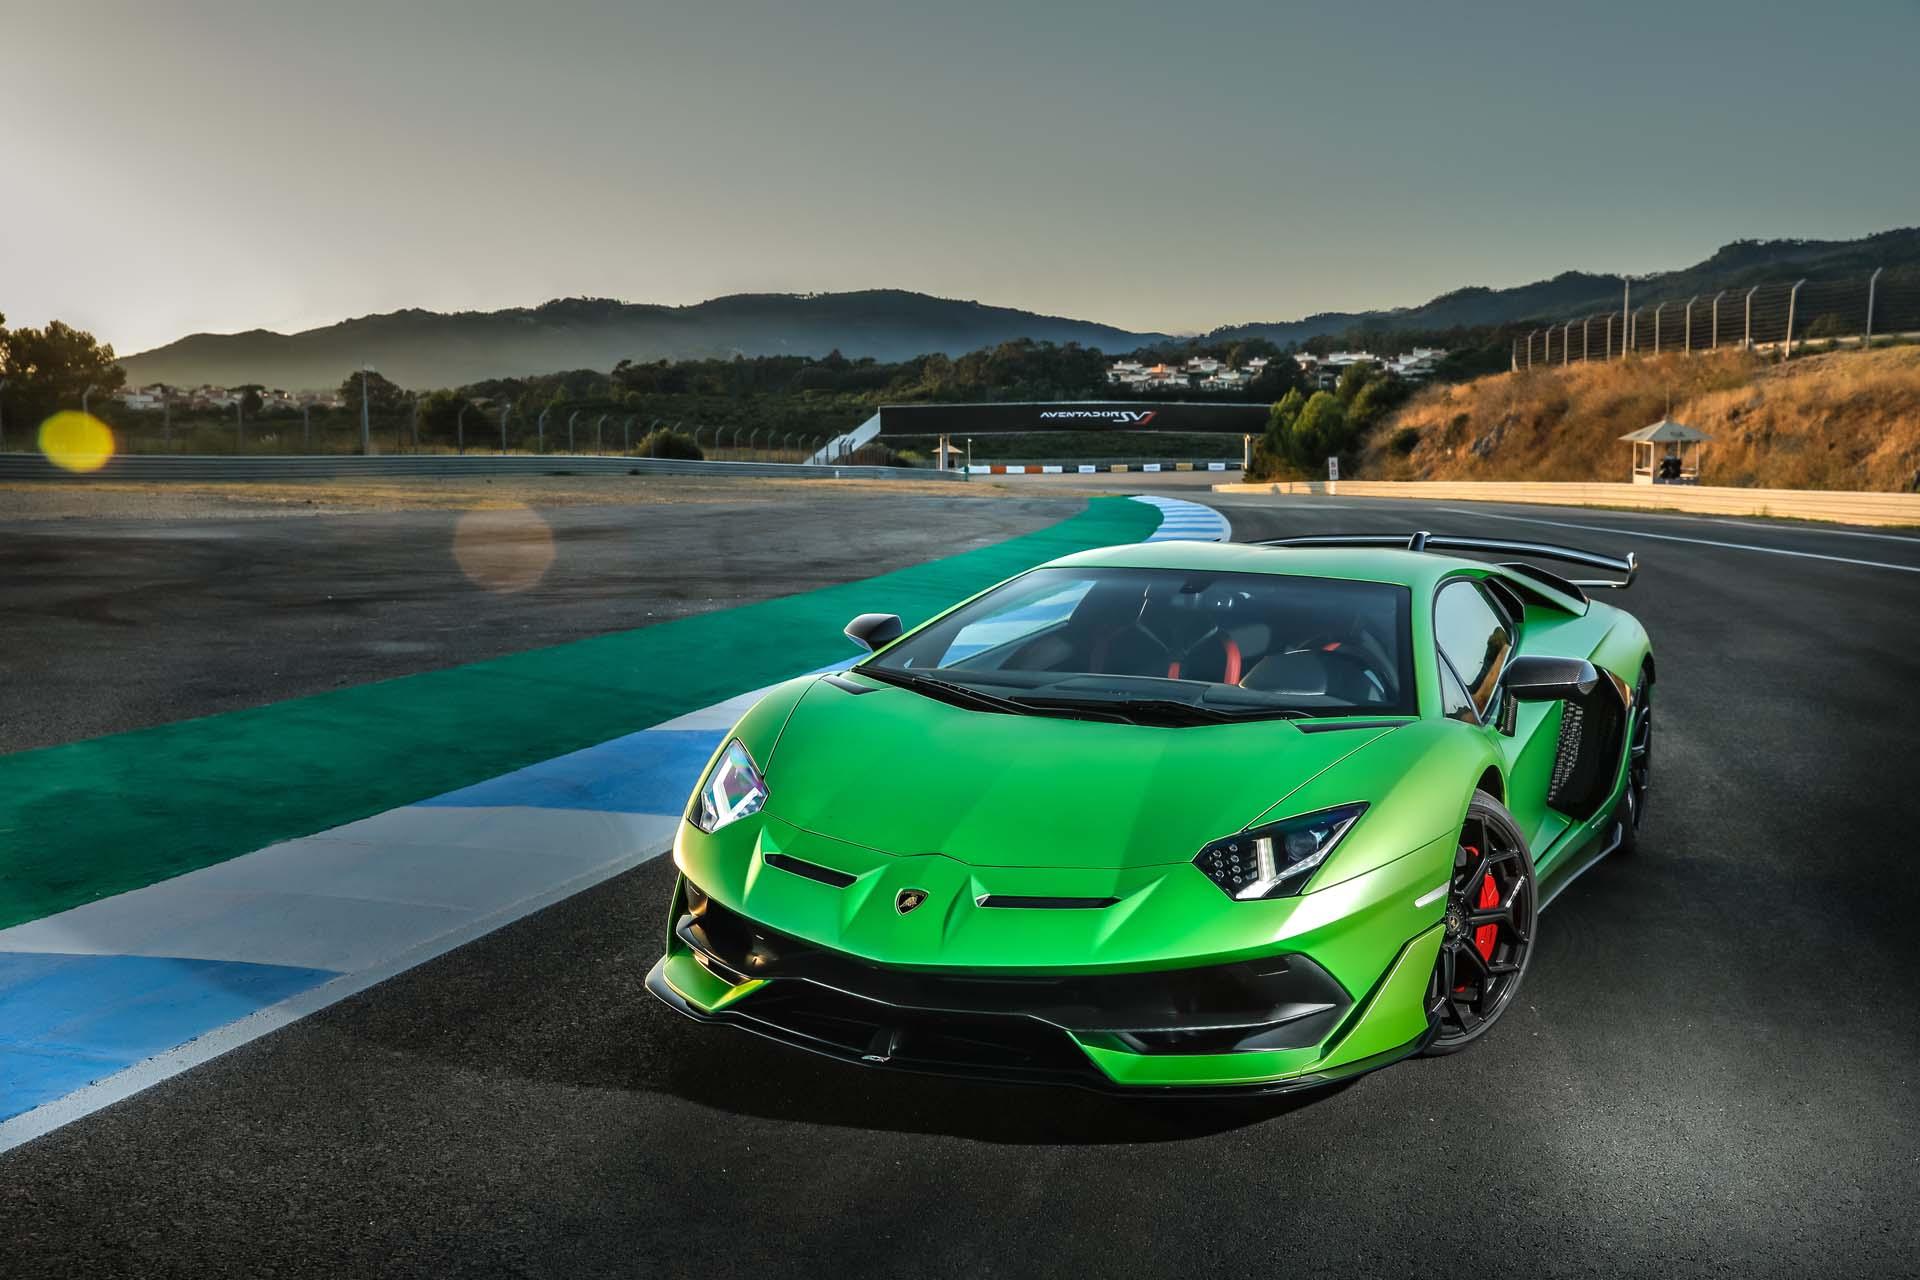 Lamborghini Aventador Replacement Arriving In 2020